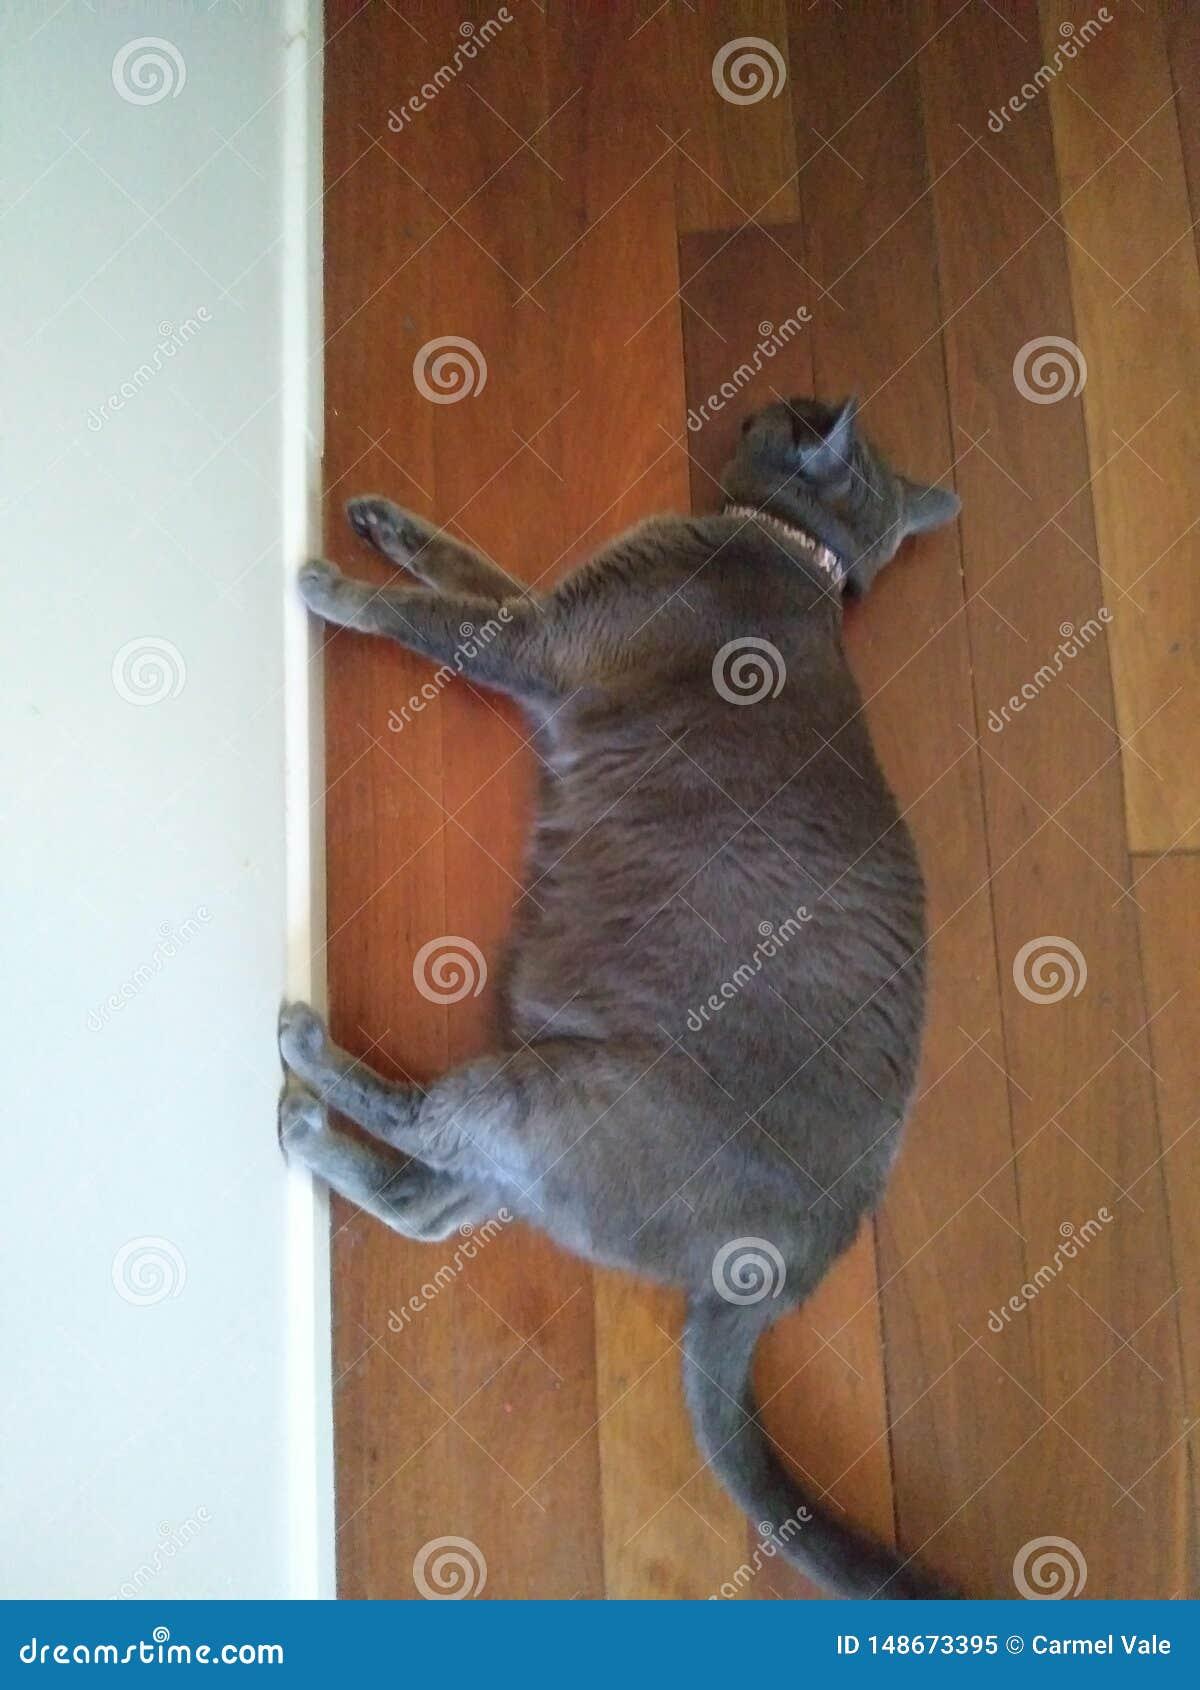 Grey cat walking on wall